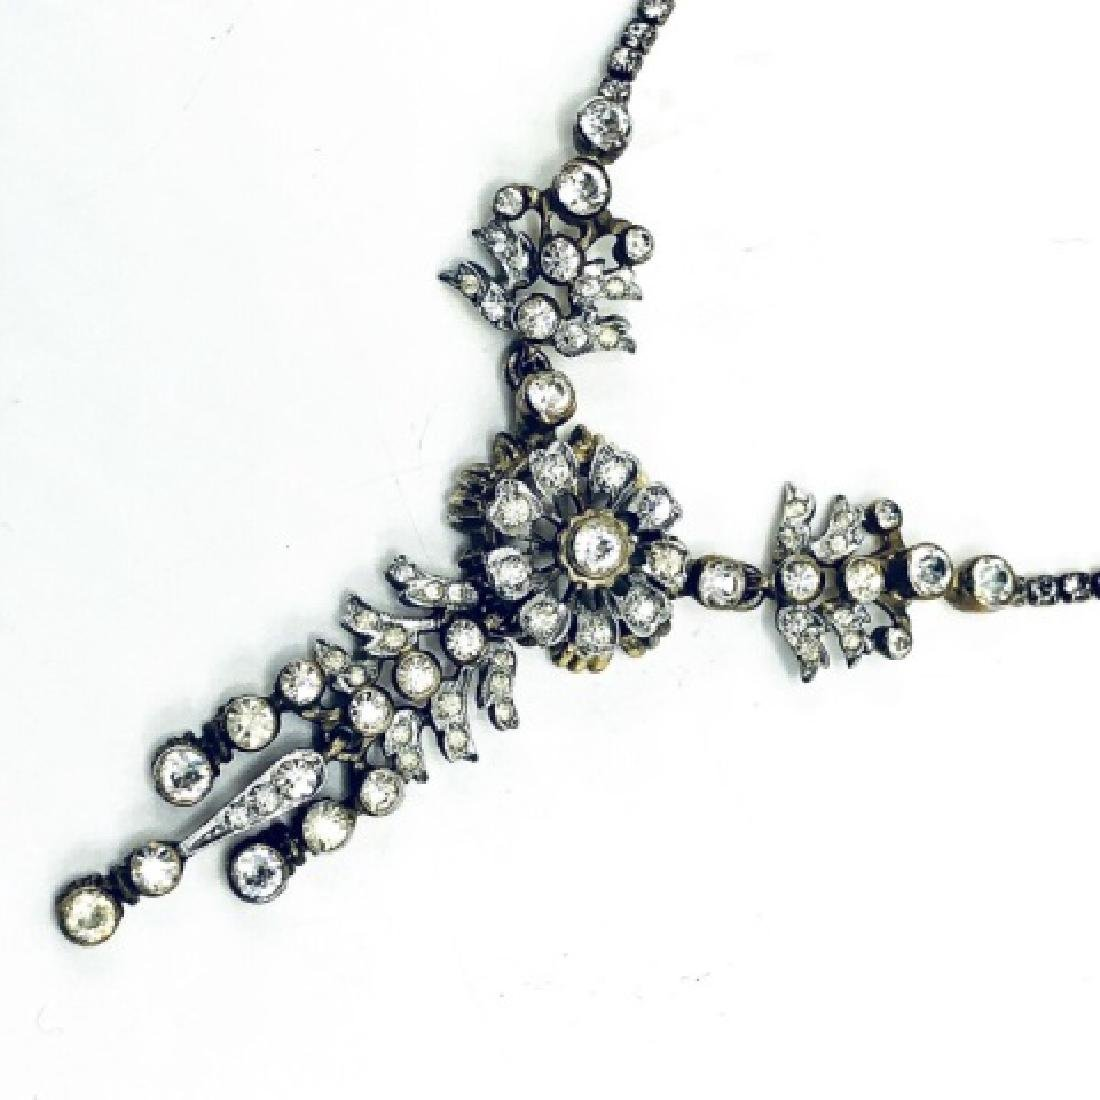 DeRosa Sterling & Rhinestone Floral Necklace - 3